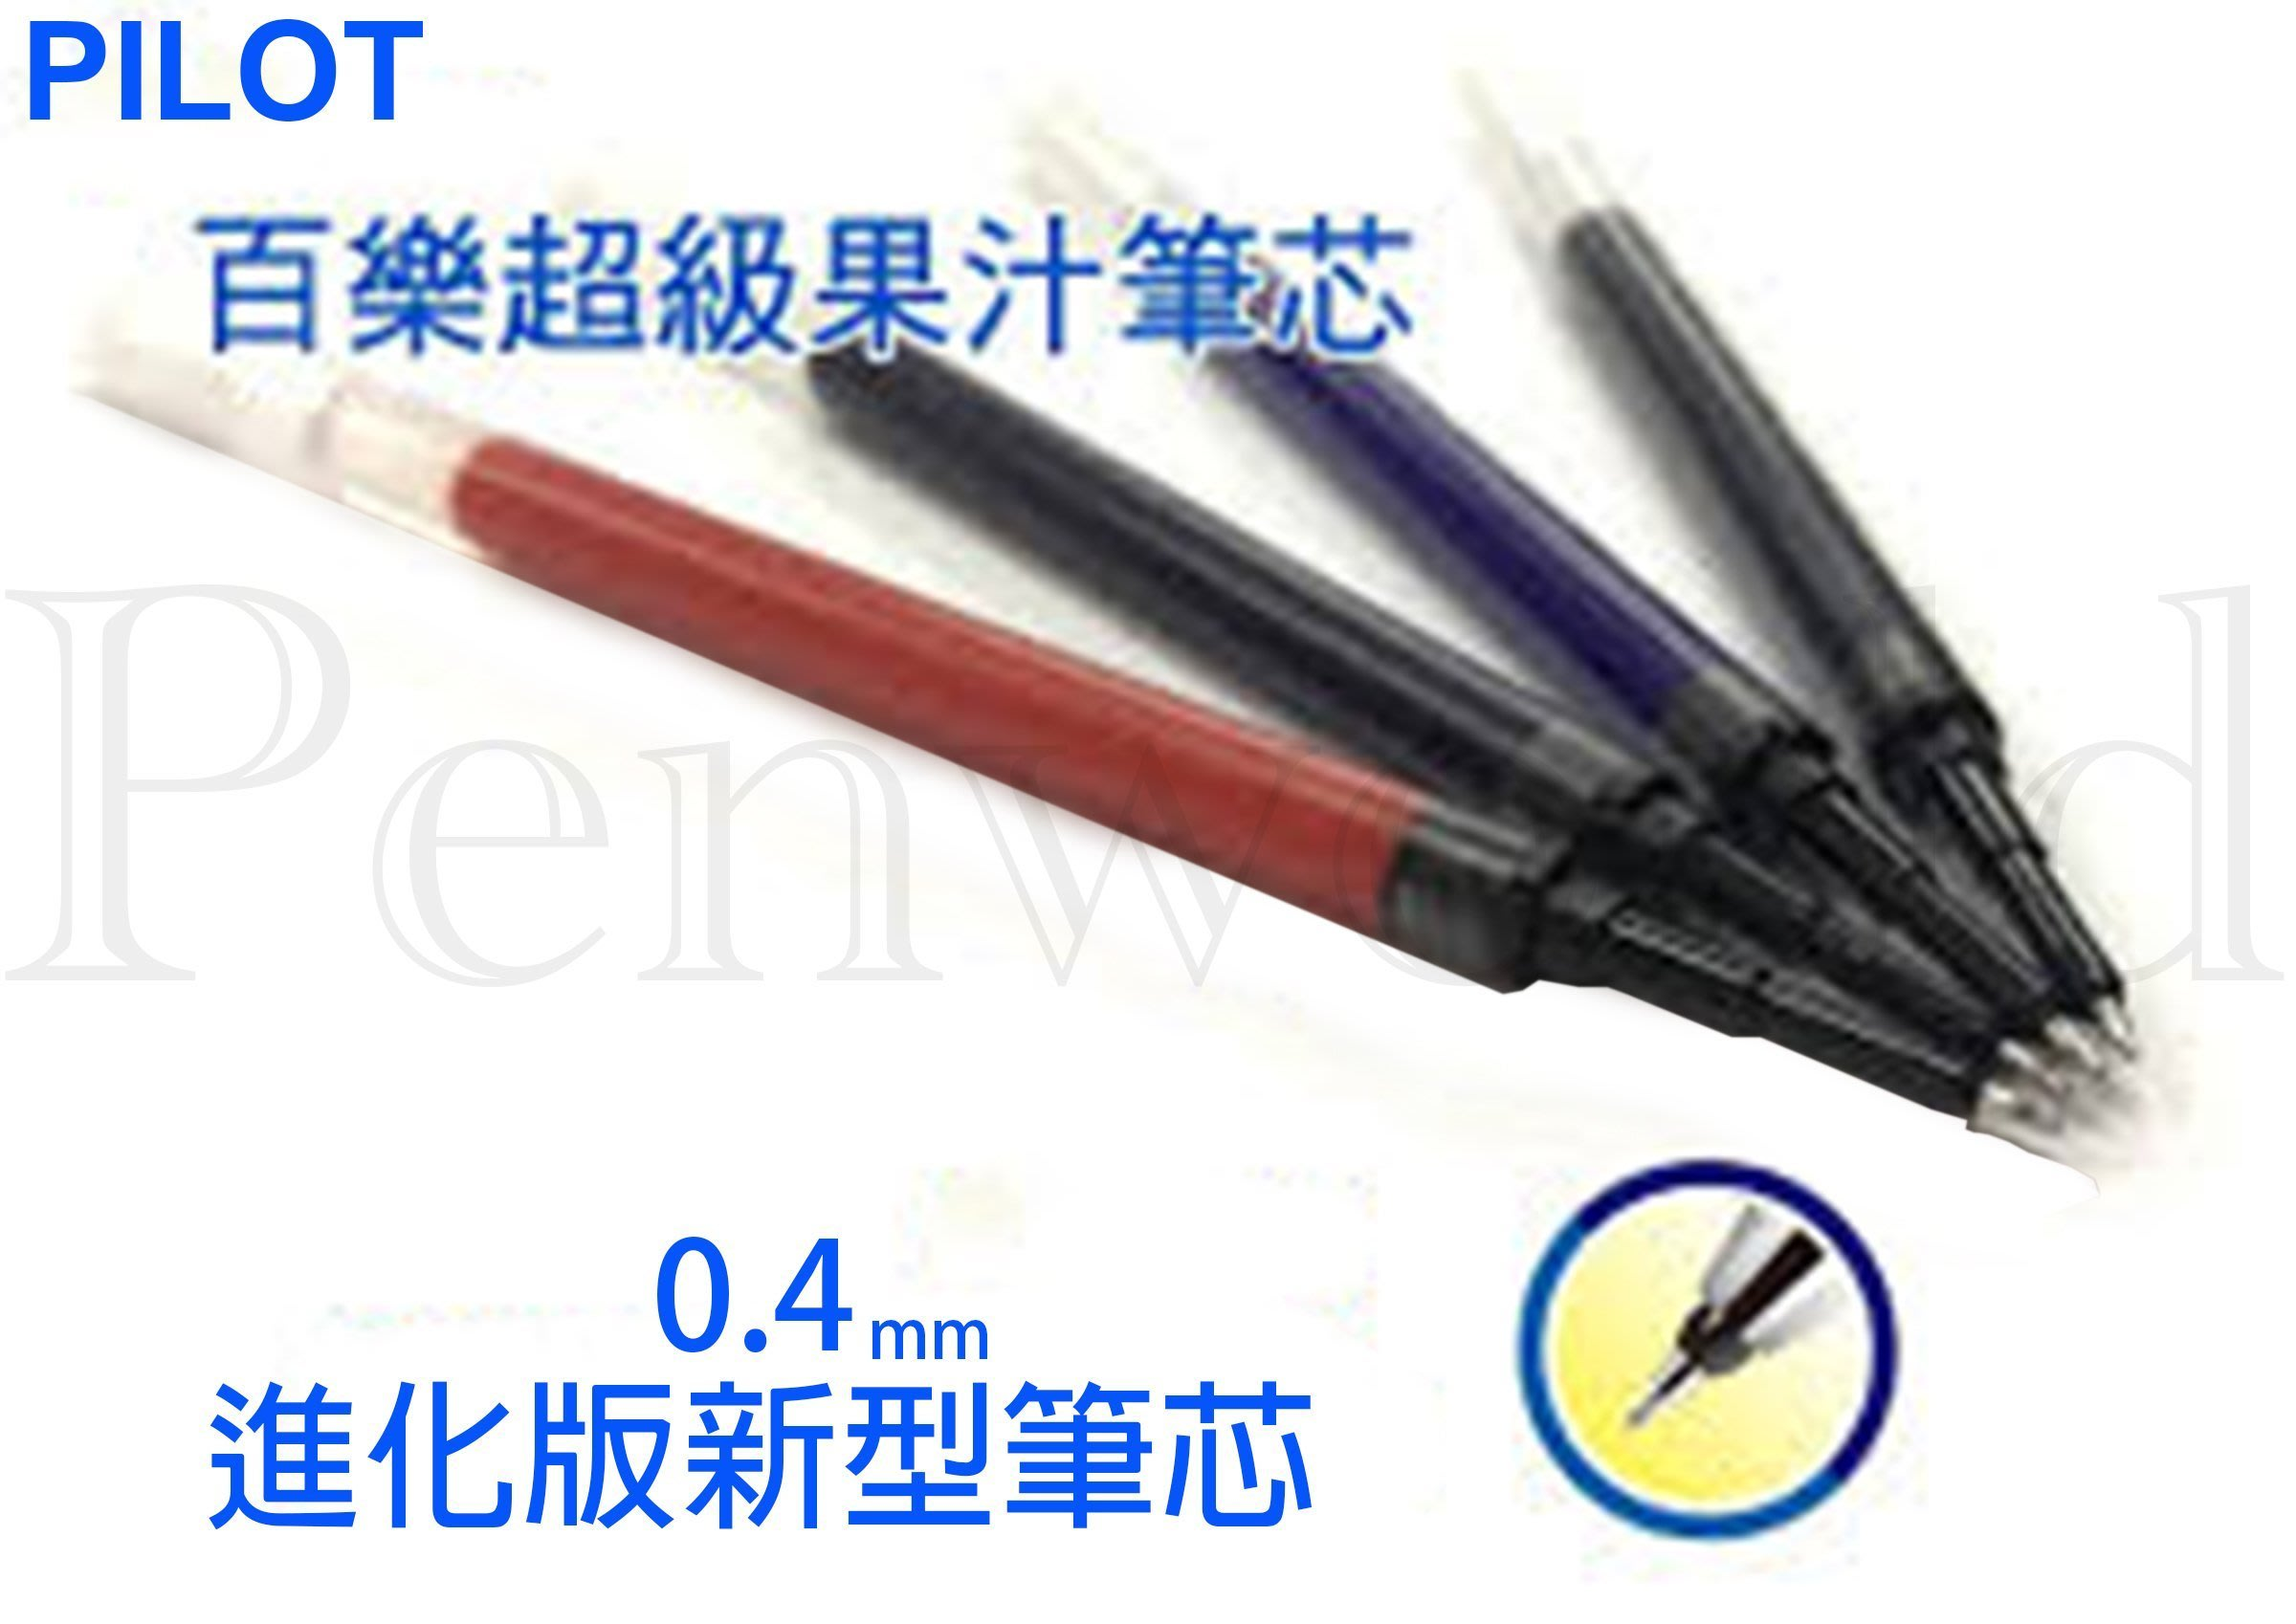 【Penworld】日本製 PILOT百樂 LP3RF12S4超級果汁筆0.4替芯 紅.藍.黑.深藍